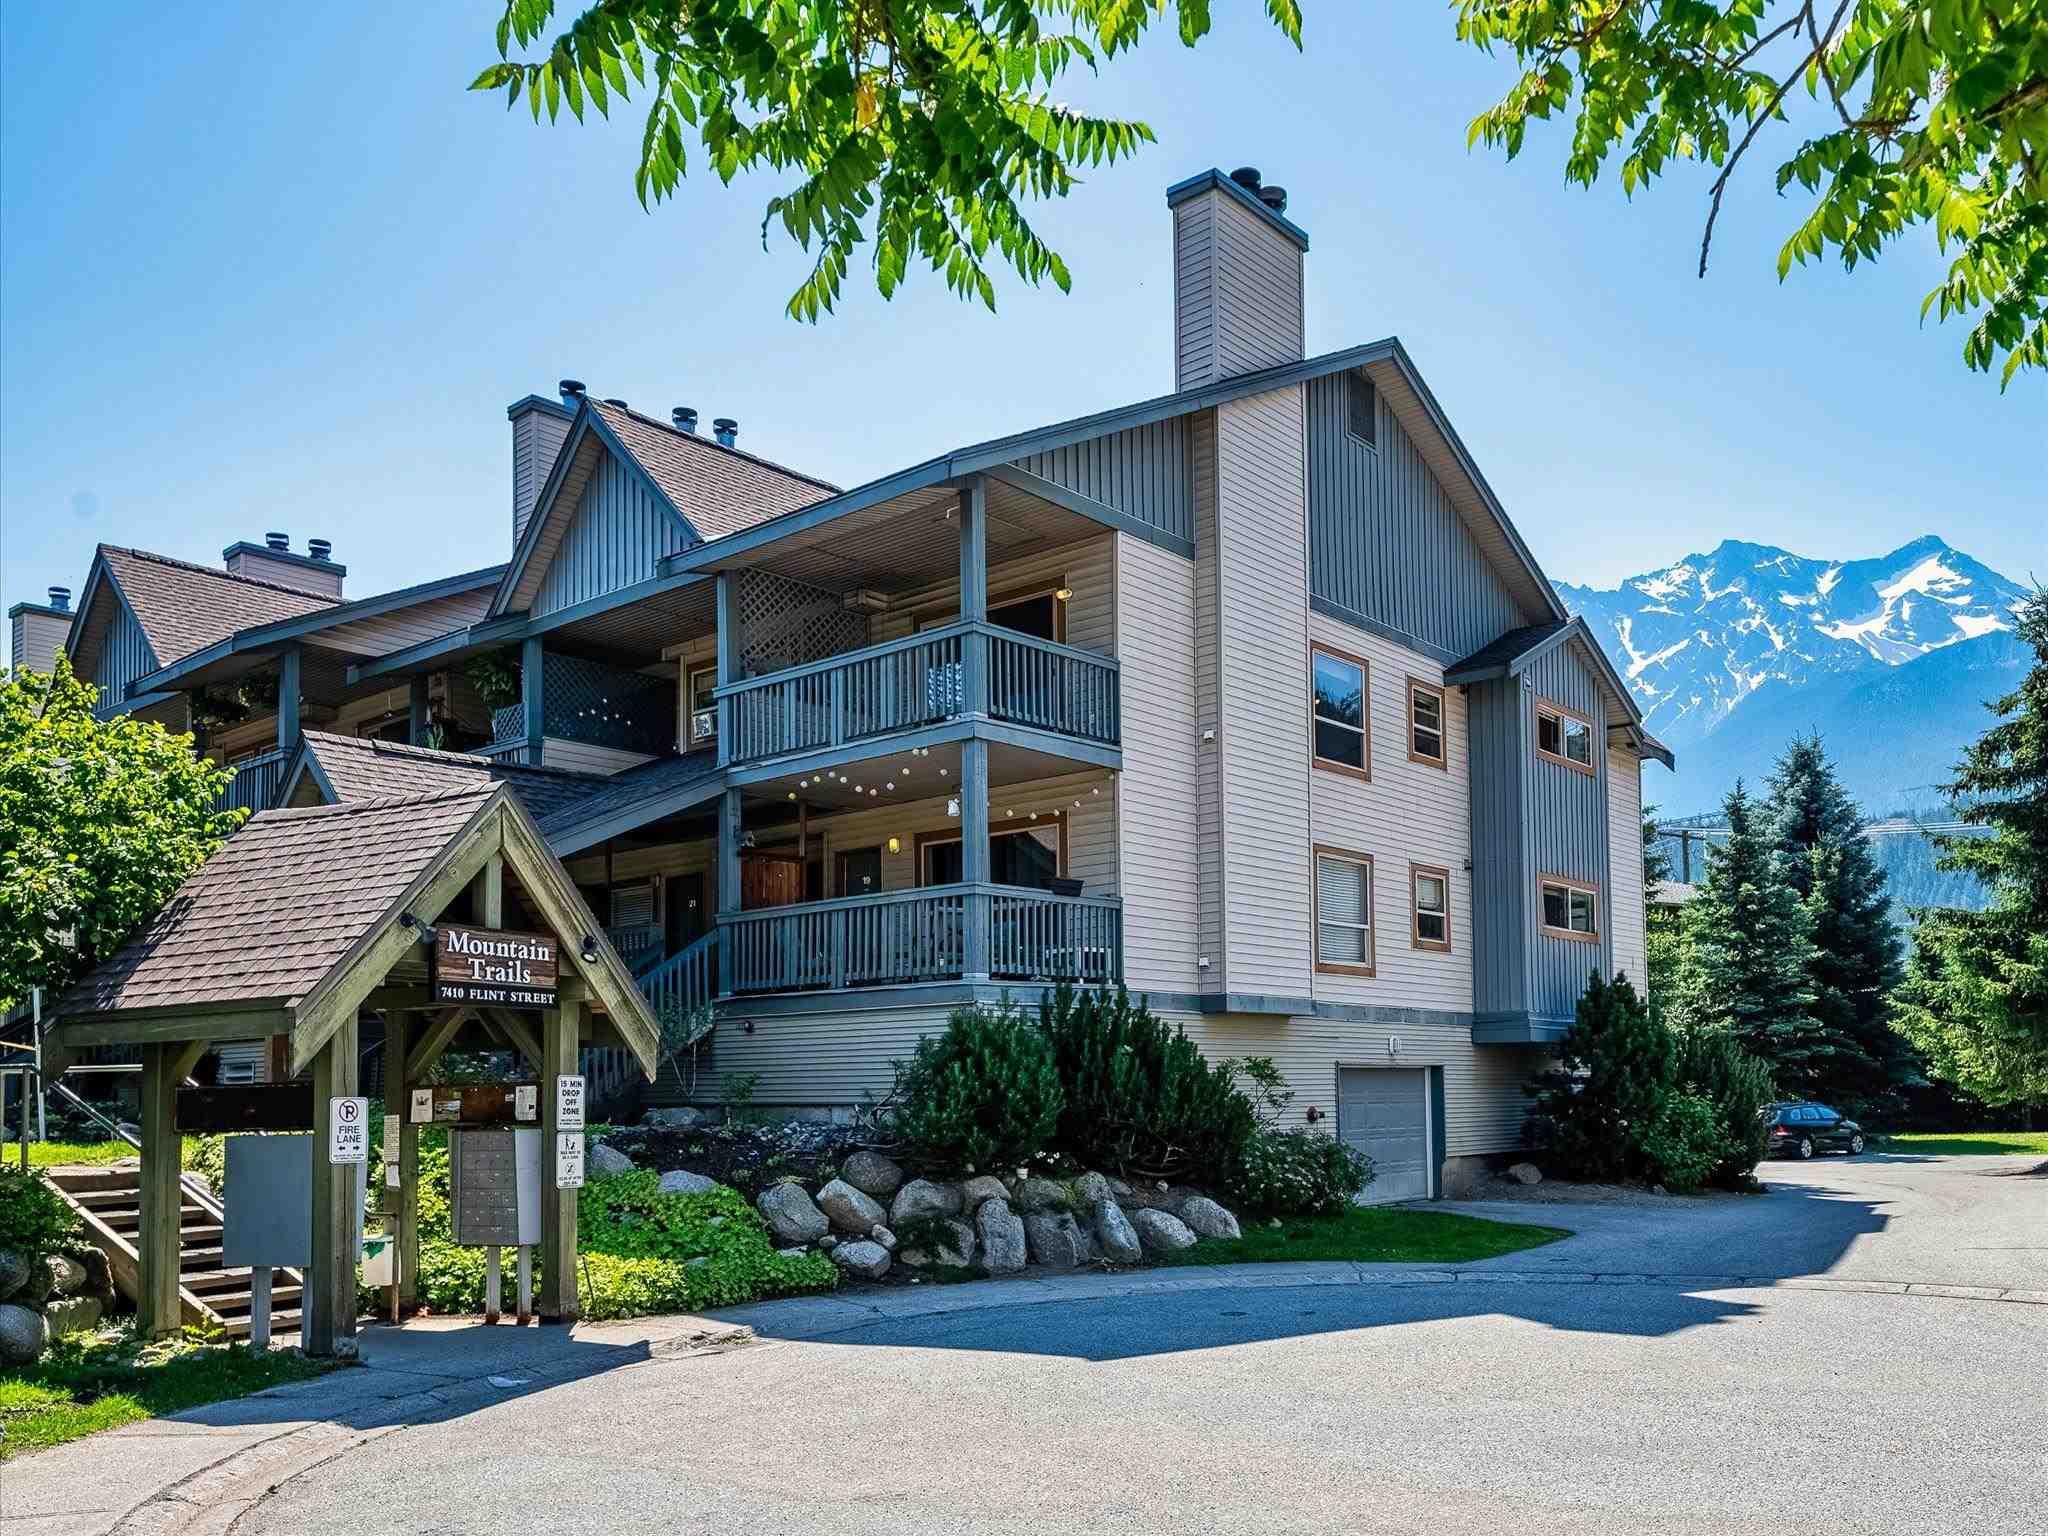 20 7410 FLINT STREET - Pemberton Townhouse for sale, 3 Bedrooms (R2597643)